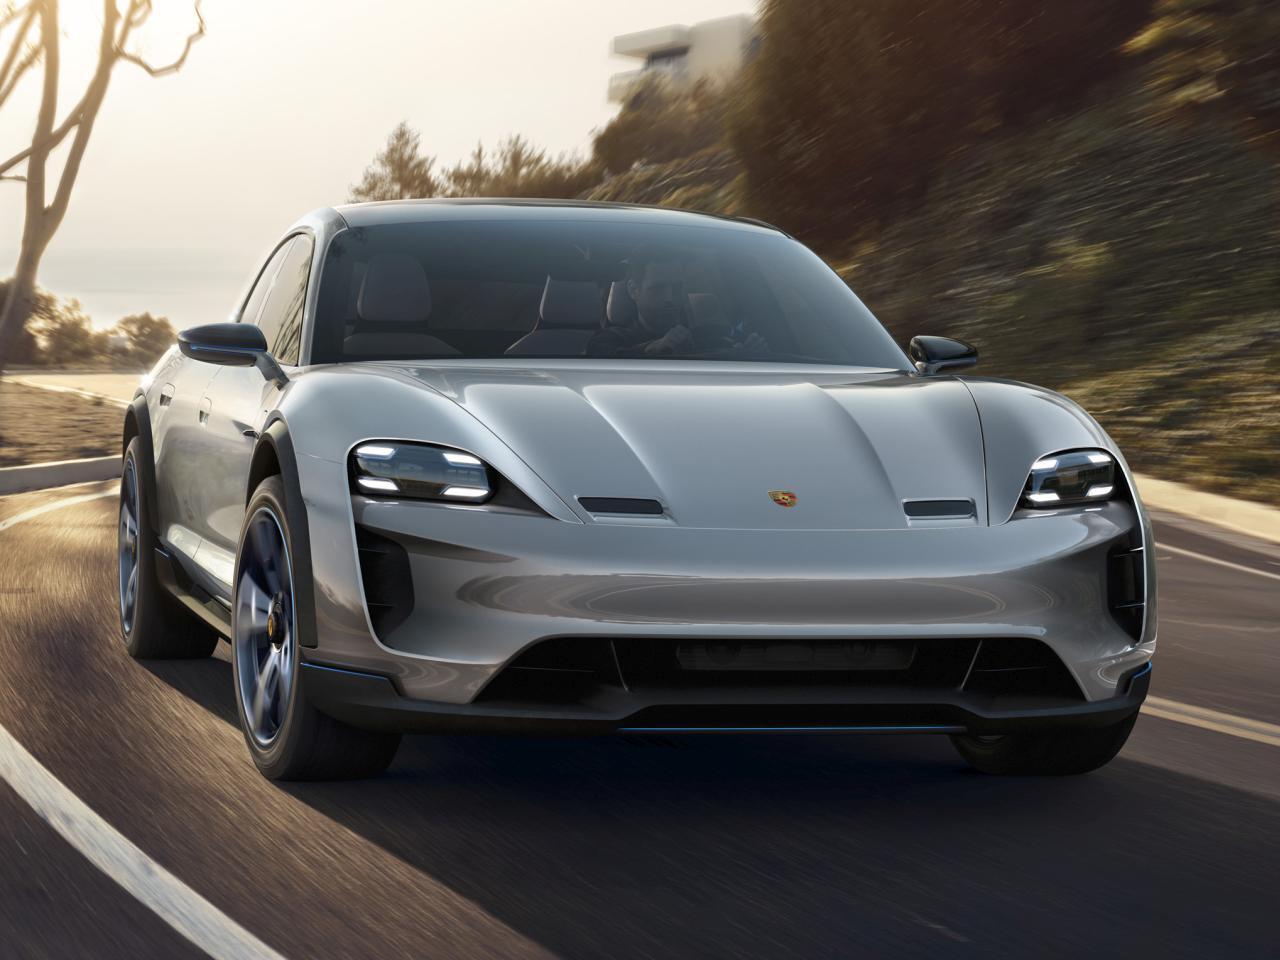 Bild zu Porsche Mission E Cross Turismo